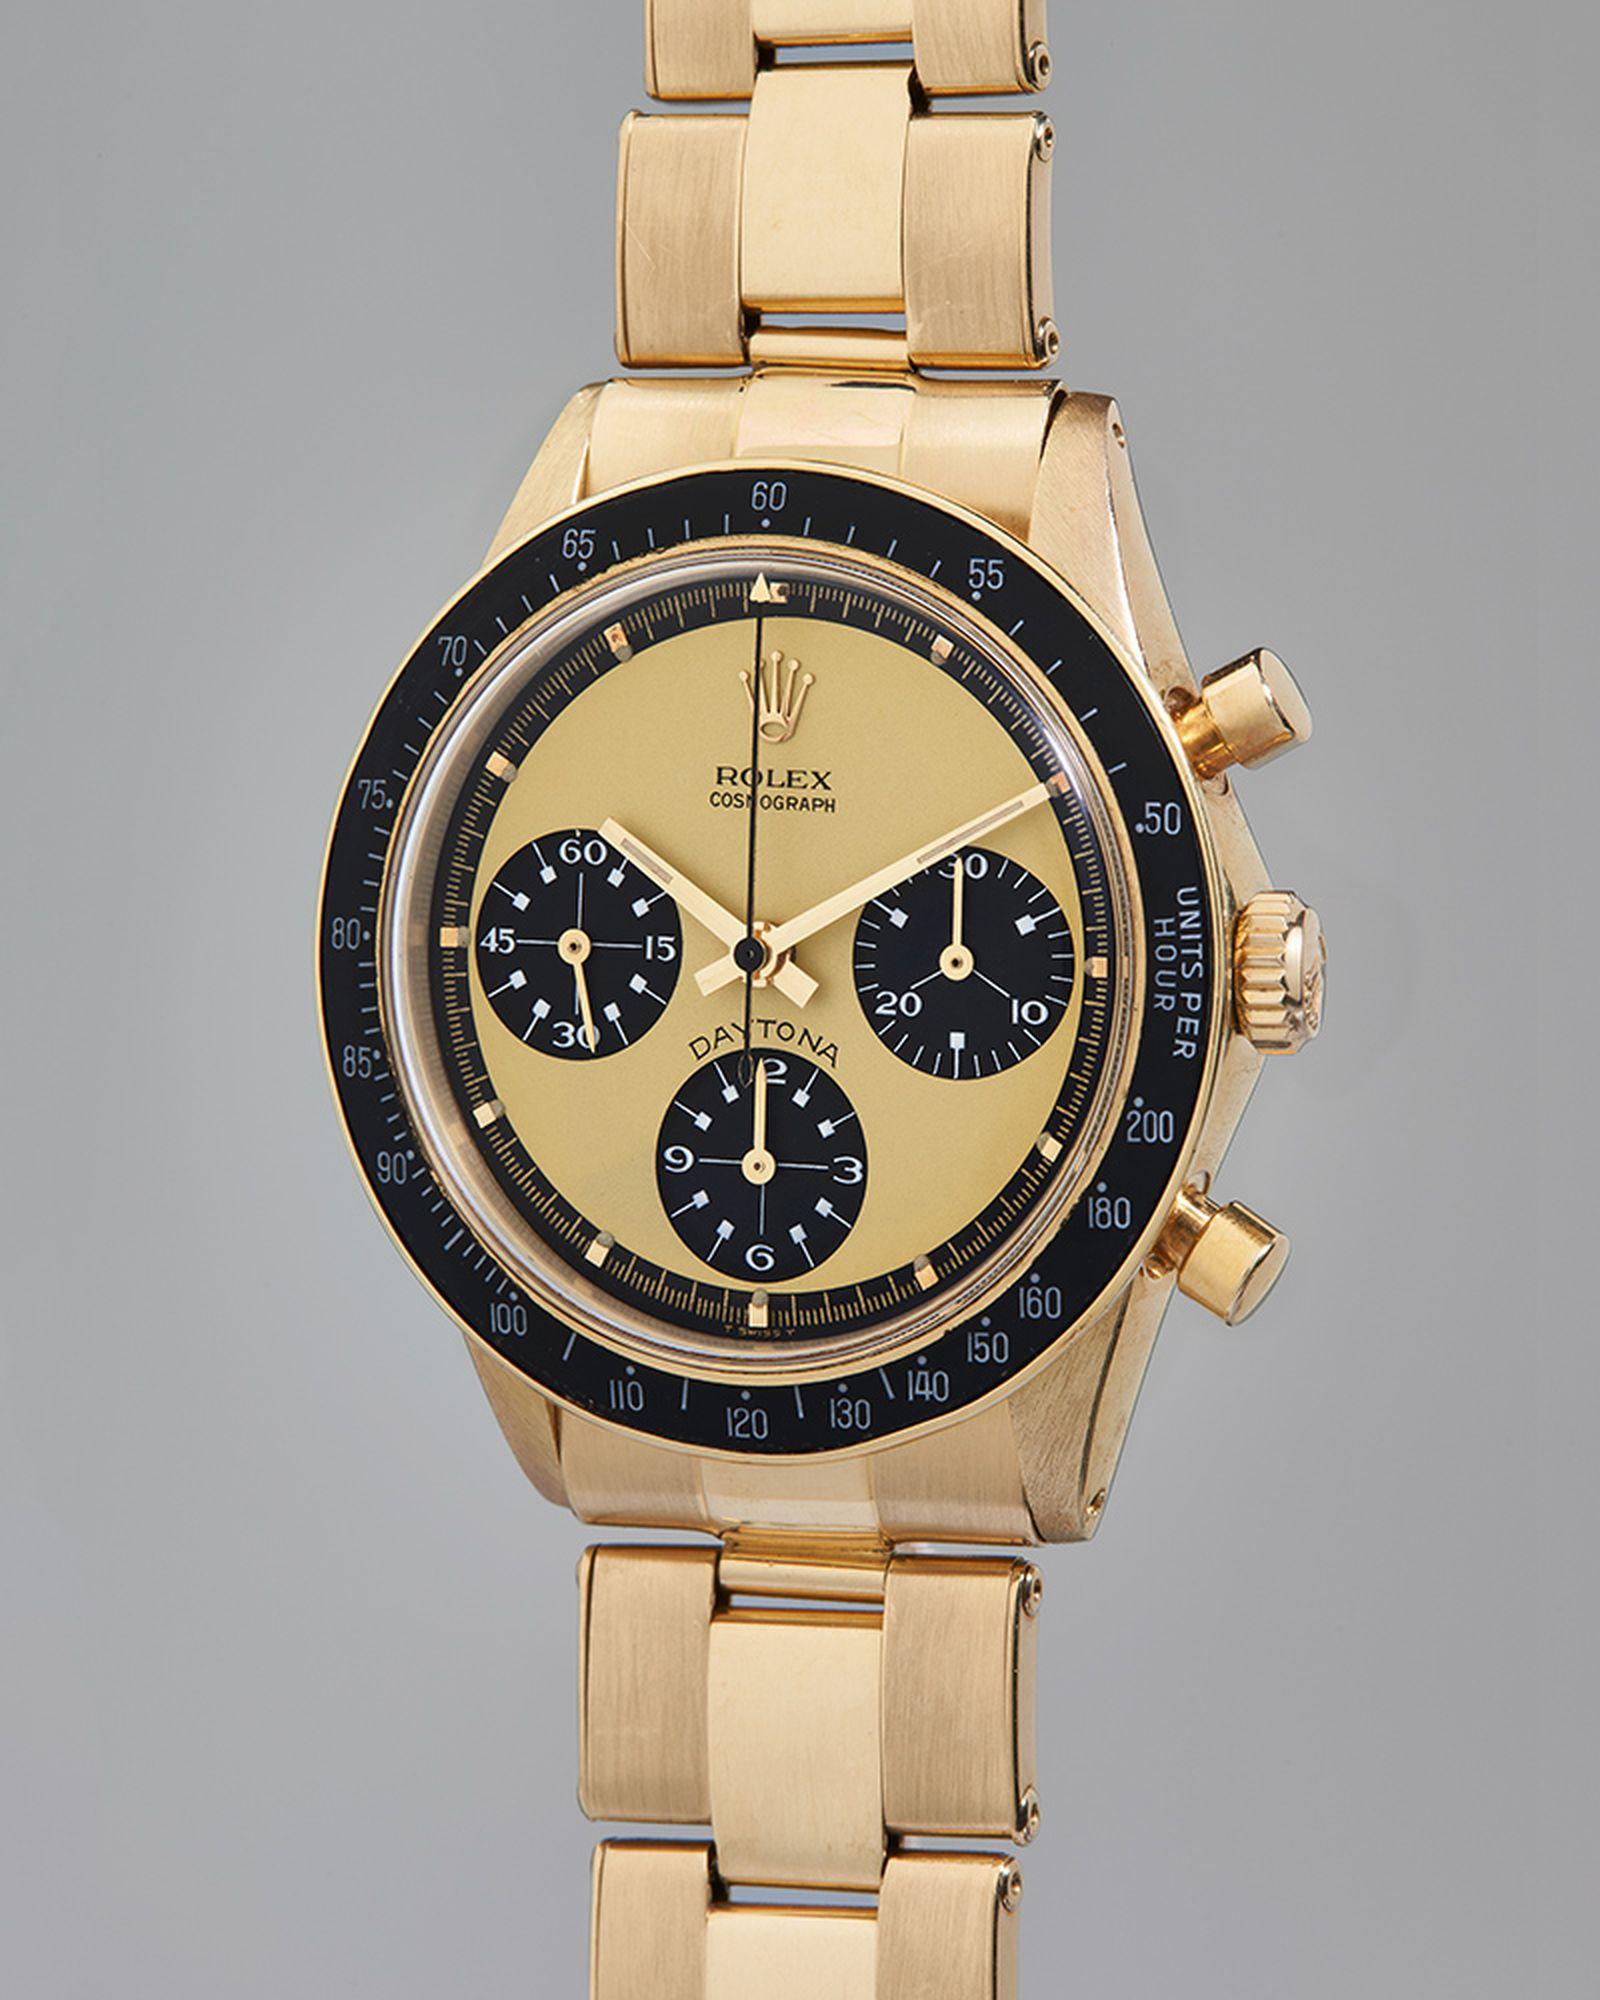 rolex-watches-phillips-auction-04